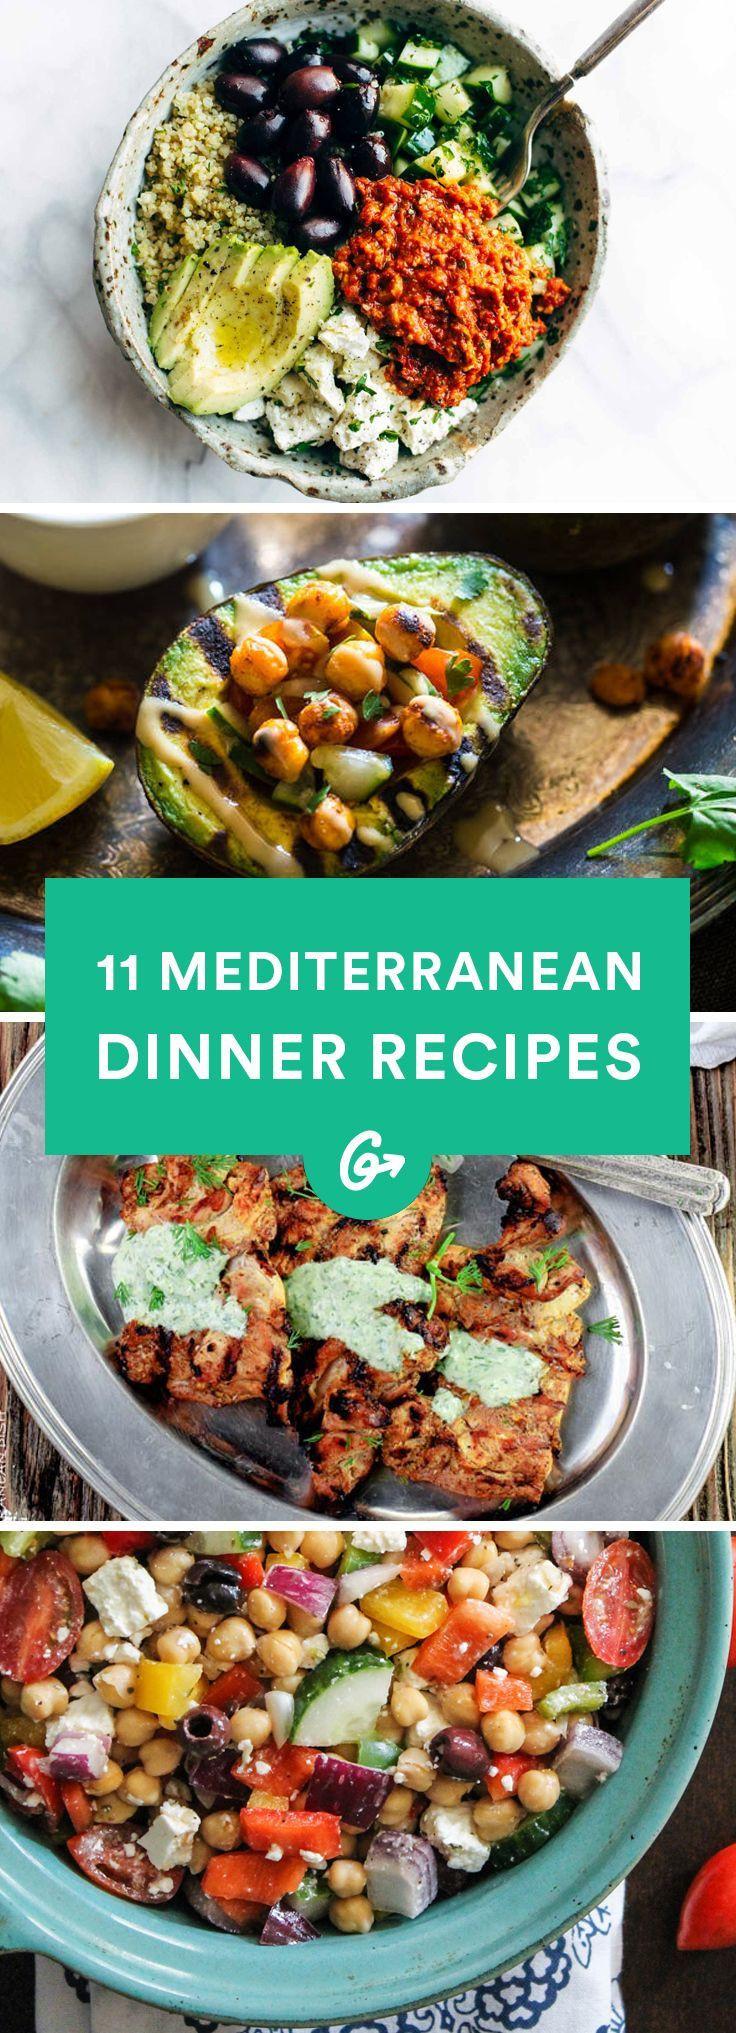 Mediterranean Dinner Recipe  13 Mediterranean Inspired Dinners to Spice Up Your